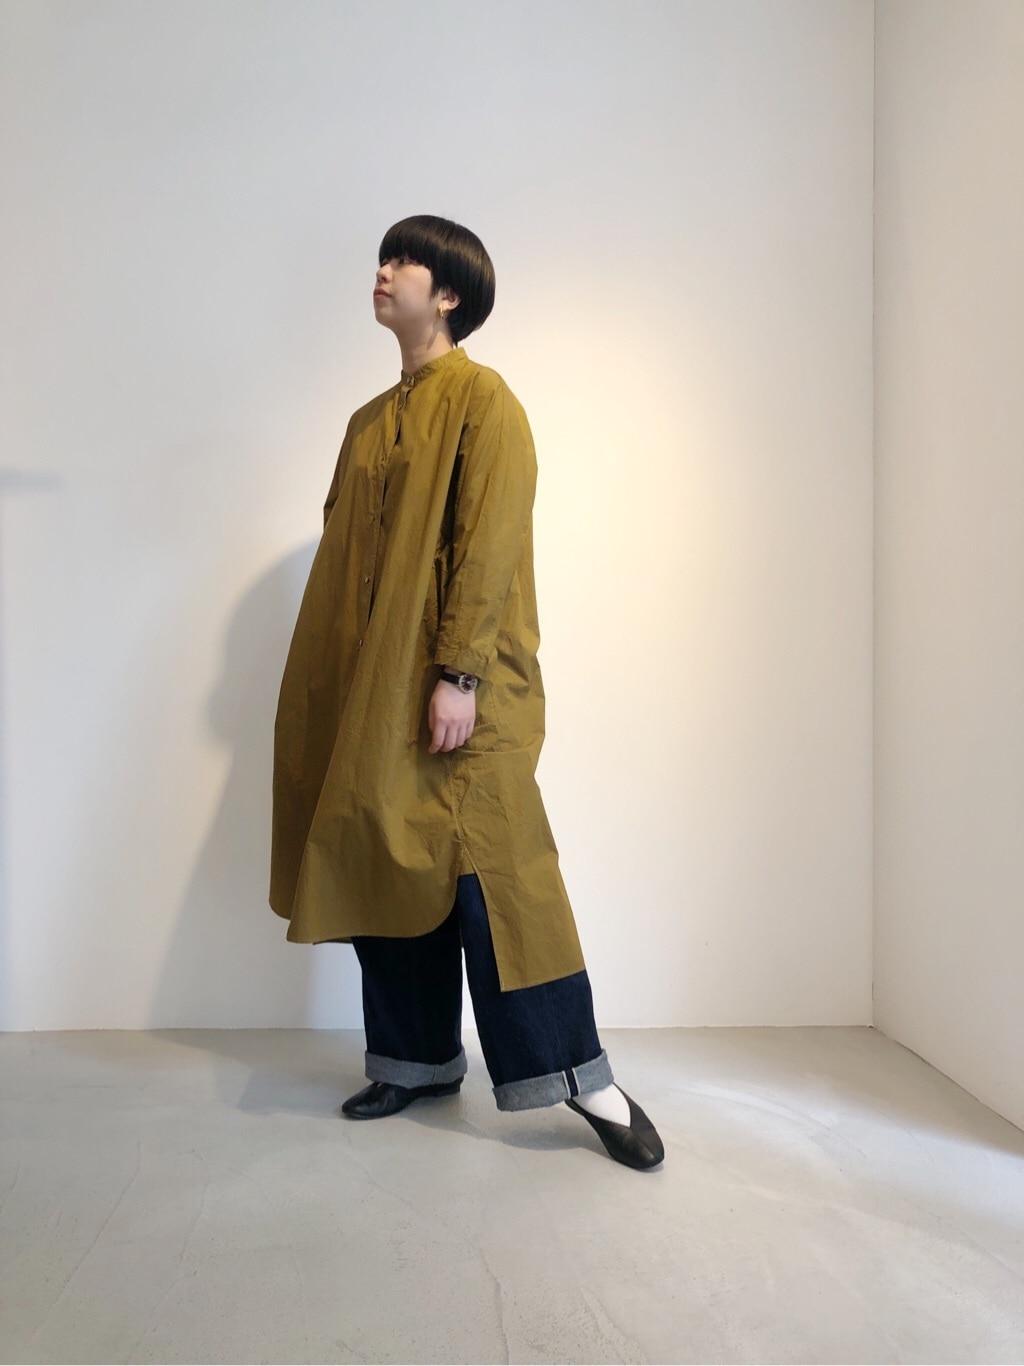 AMB SHOP l'atelier du savon FLAT AMB 天神イムズ 身長:156cm 2020.02.26